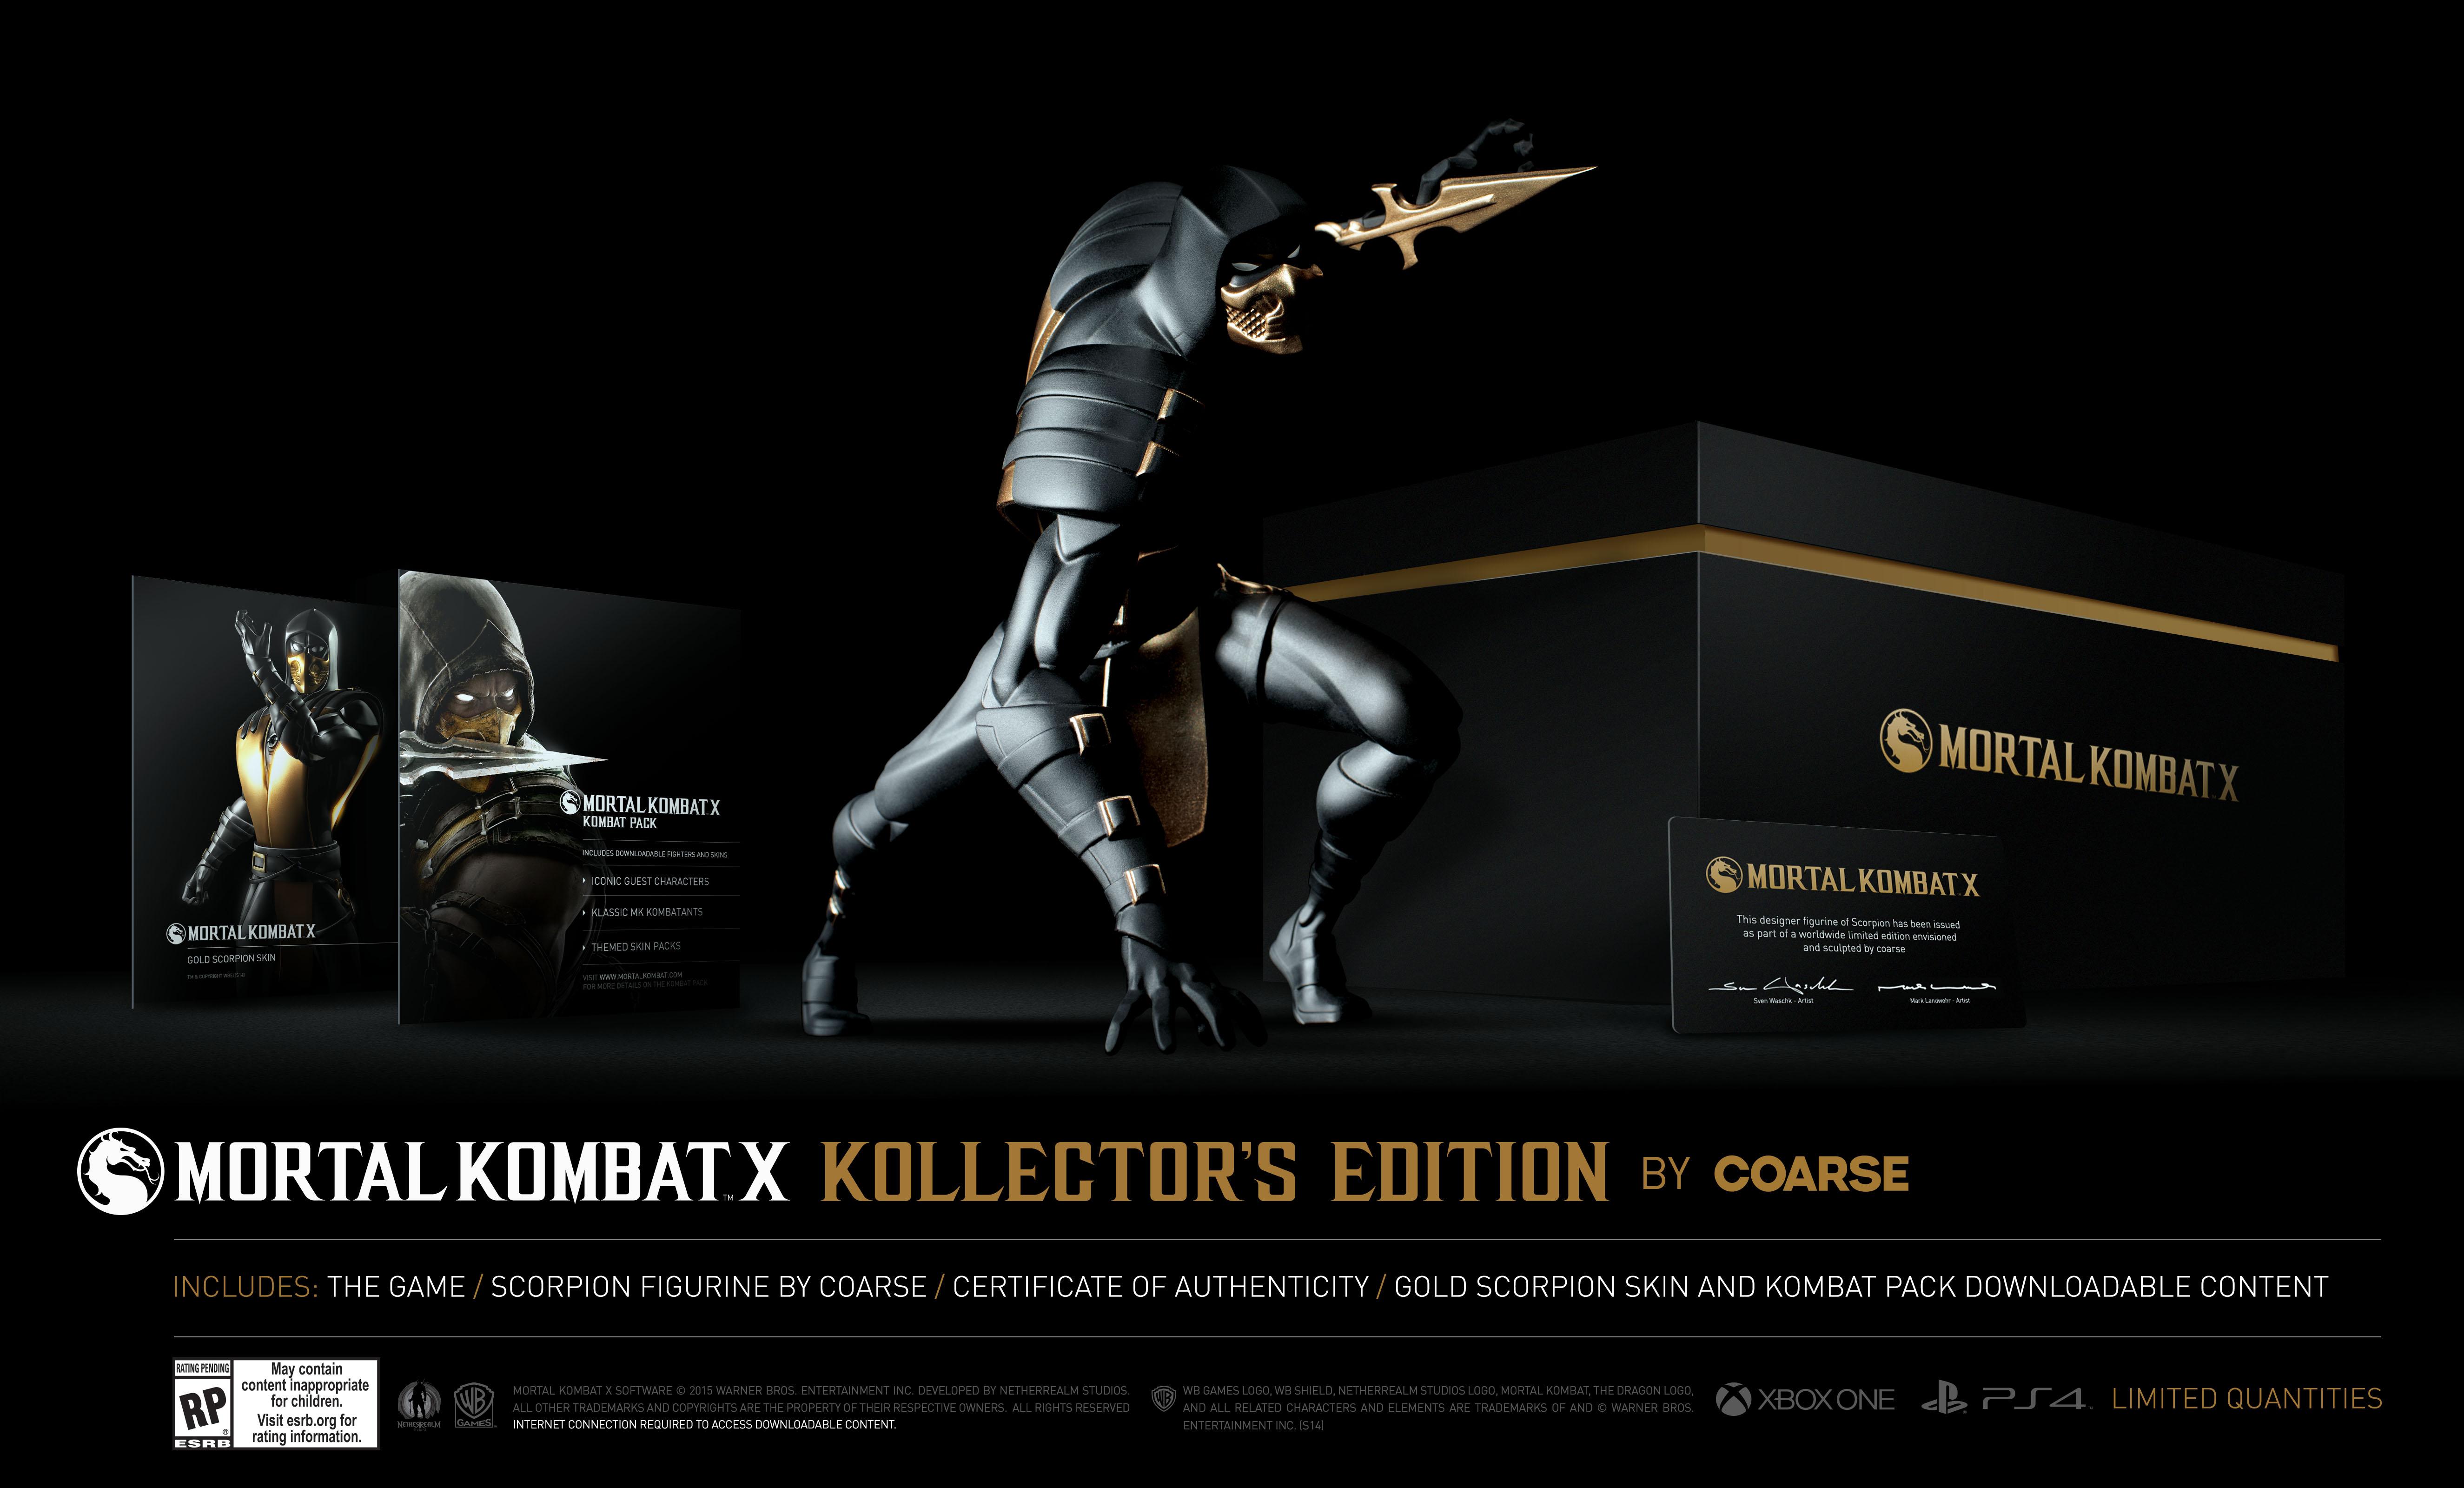 Mortal kombat 9 komplete edition ( ps3 ): sub zero ( fatalities +.